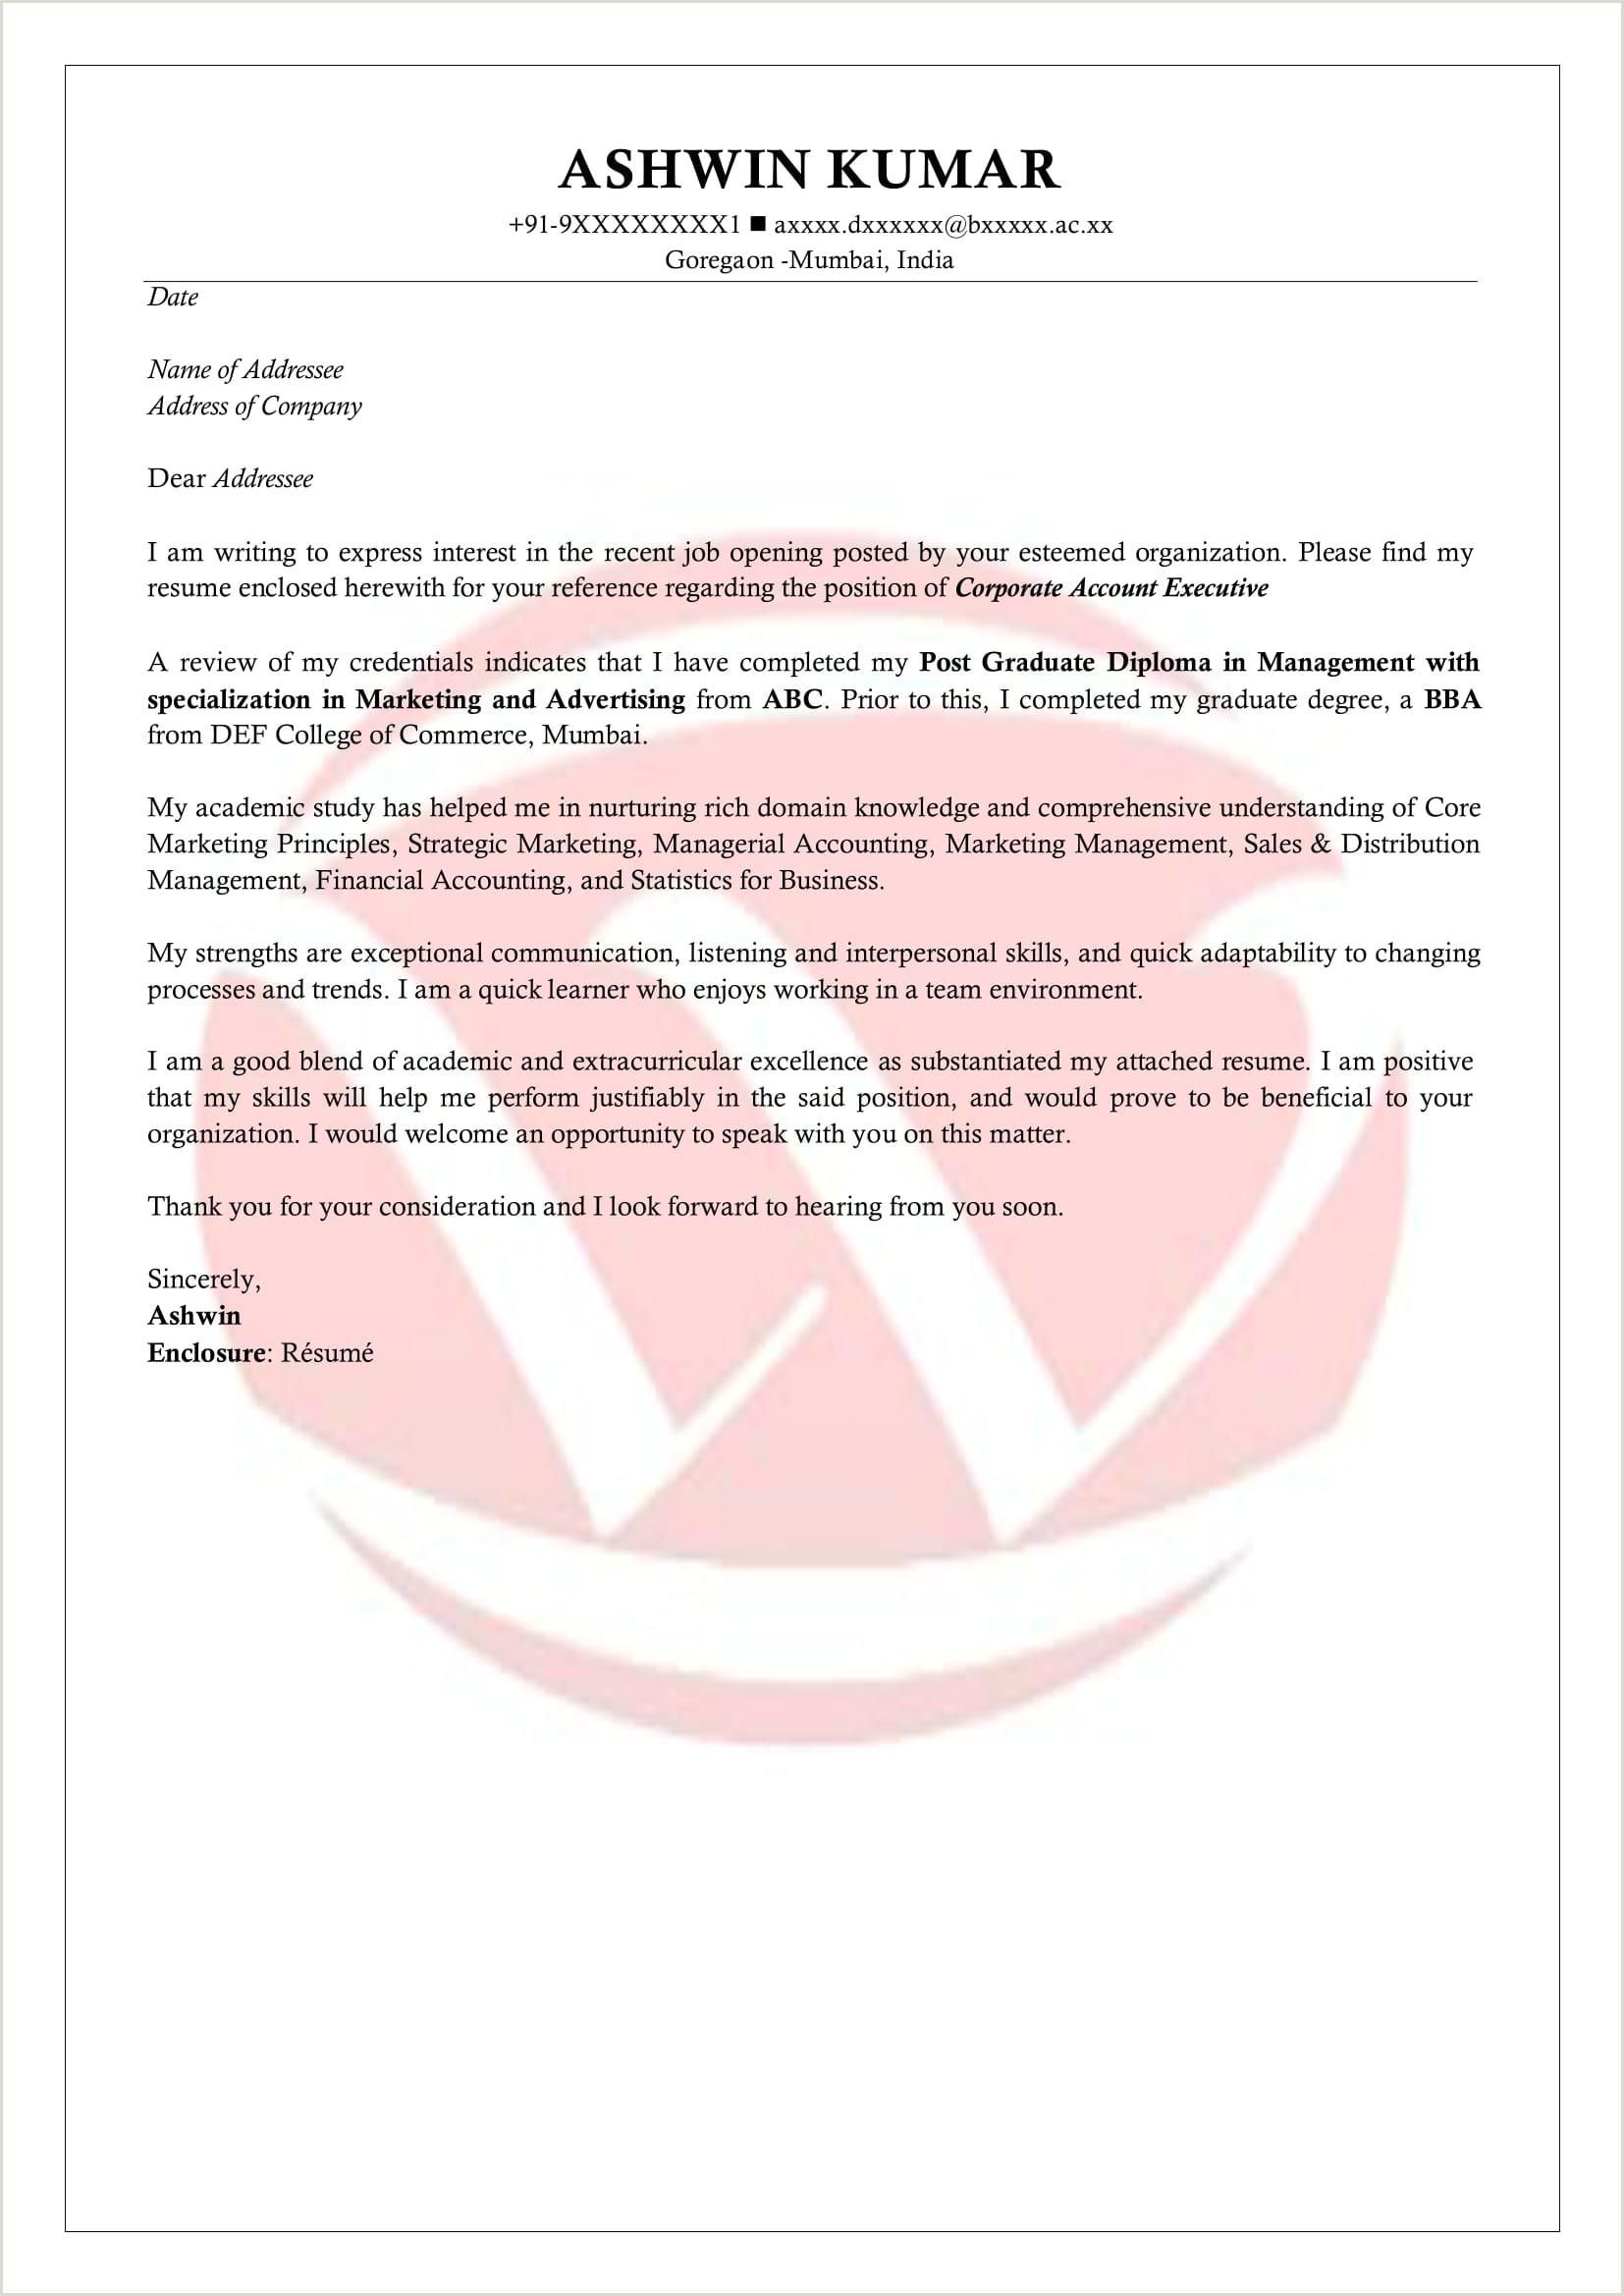 Sample Resume for Linux System Administrator Fresher Freshers Sample Cover Letter format Download Cover Letter